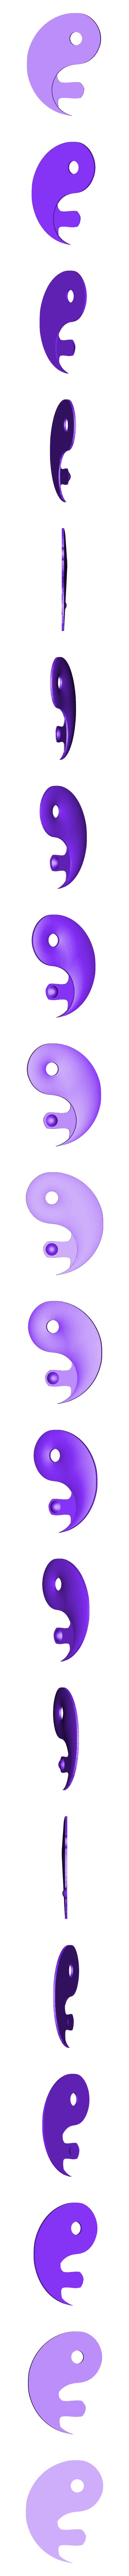 Yin et yang.stl Download free STL file Yin and yang • 3D printer design, robinwood87cnc